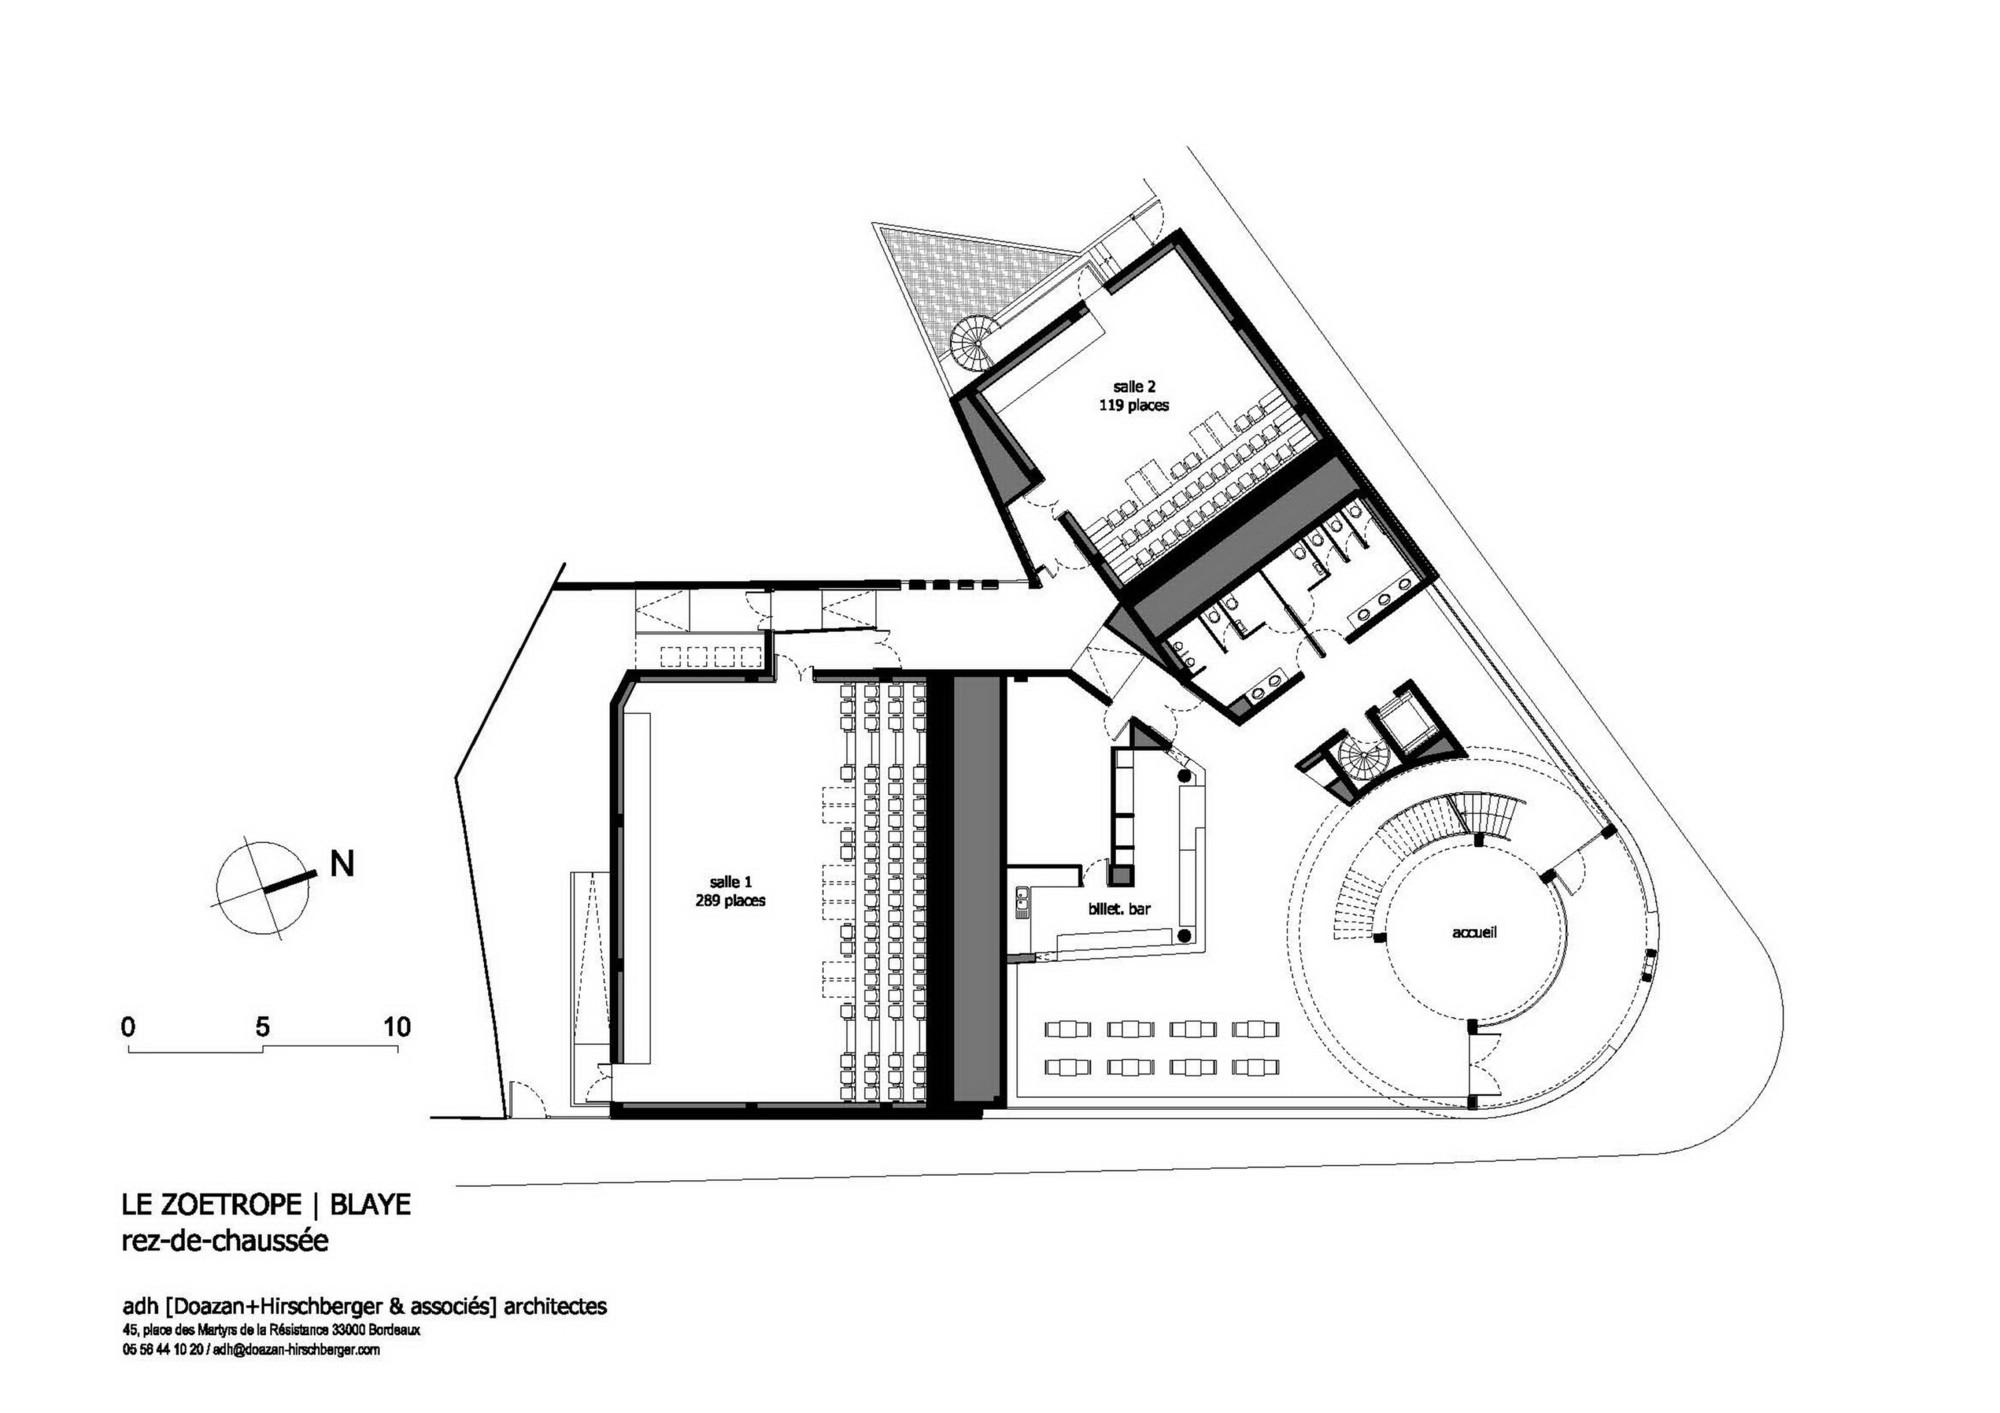 Zoetrope Cinema / ADH. Ground Floor Plan